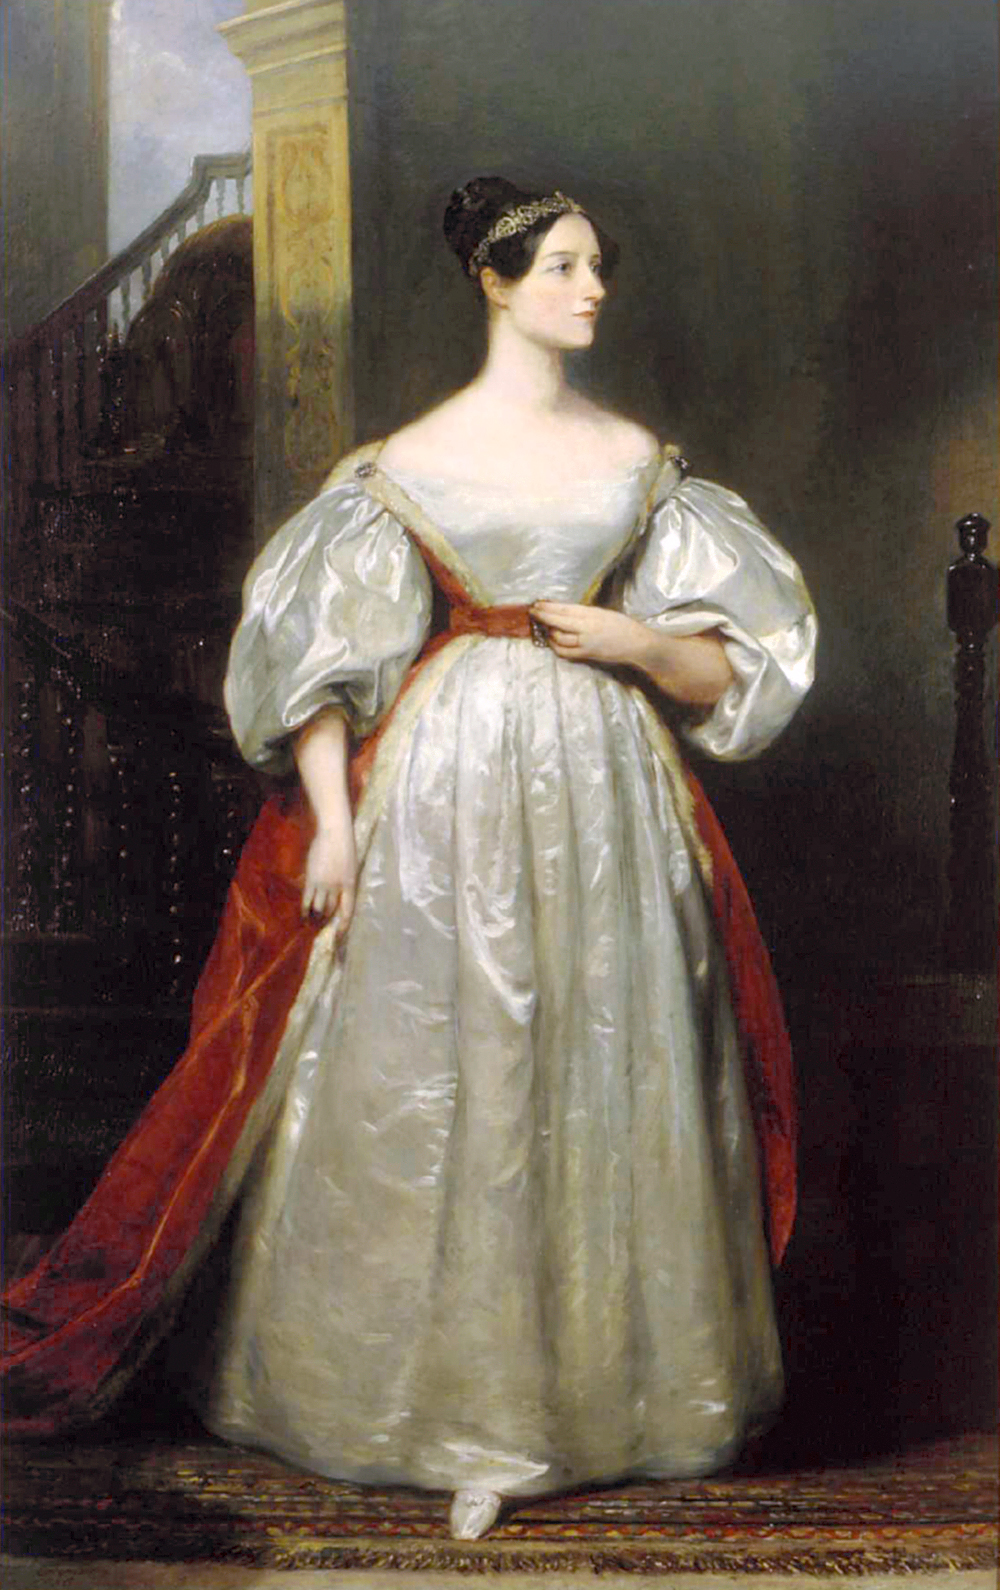 http://fr.academic.ru/pictures/frwiki/65/Ada_Lovelace.jpg